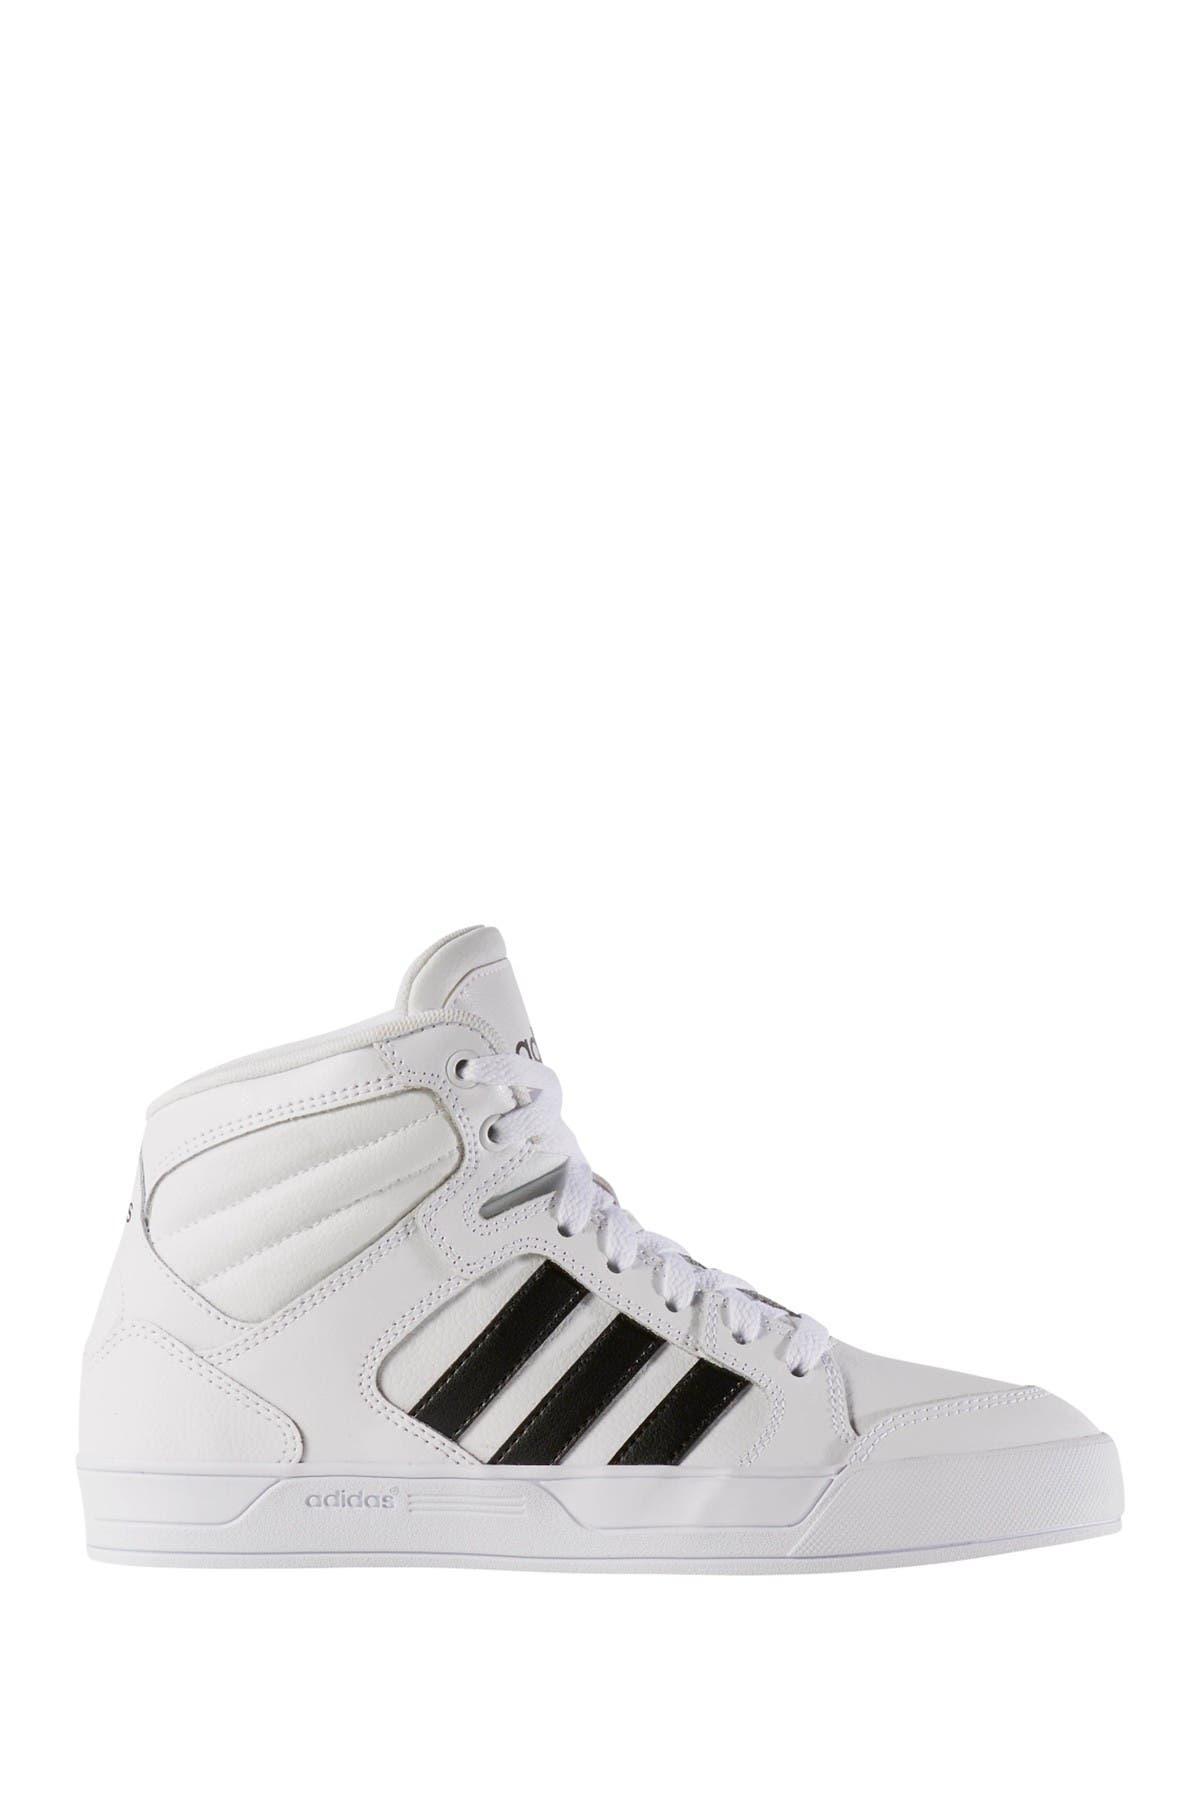 adidas | Raleigh Mid Sneaker